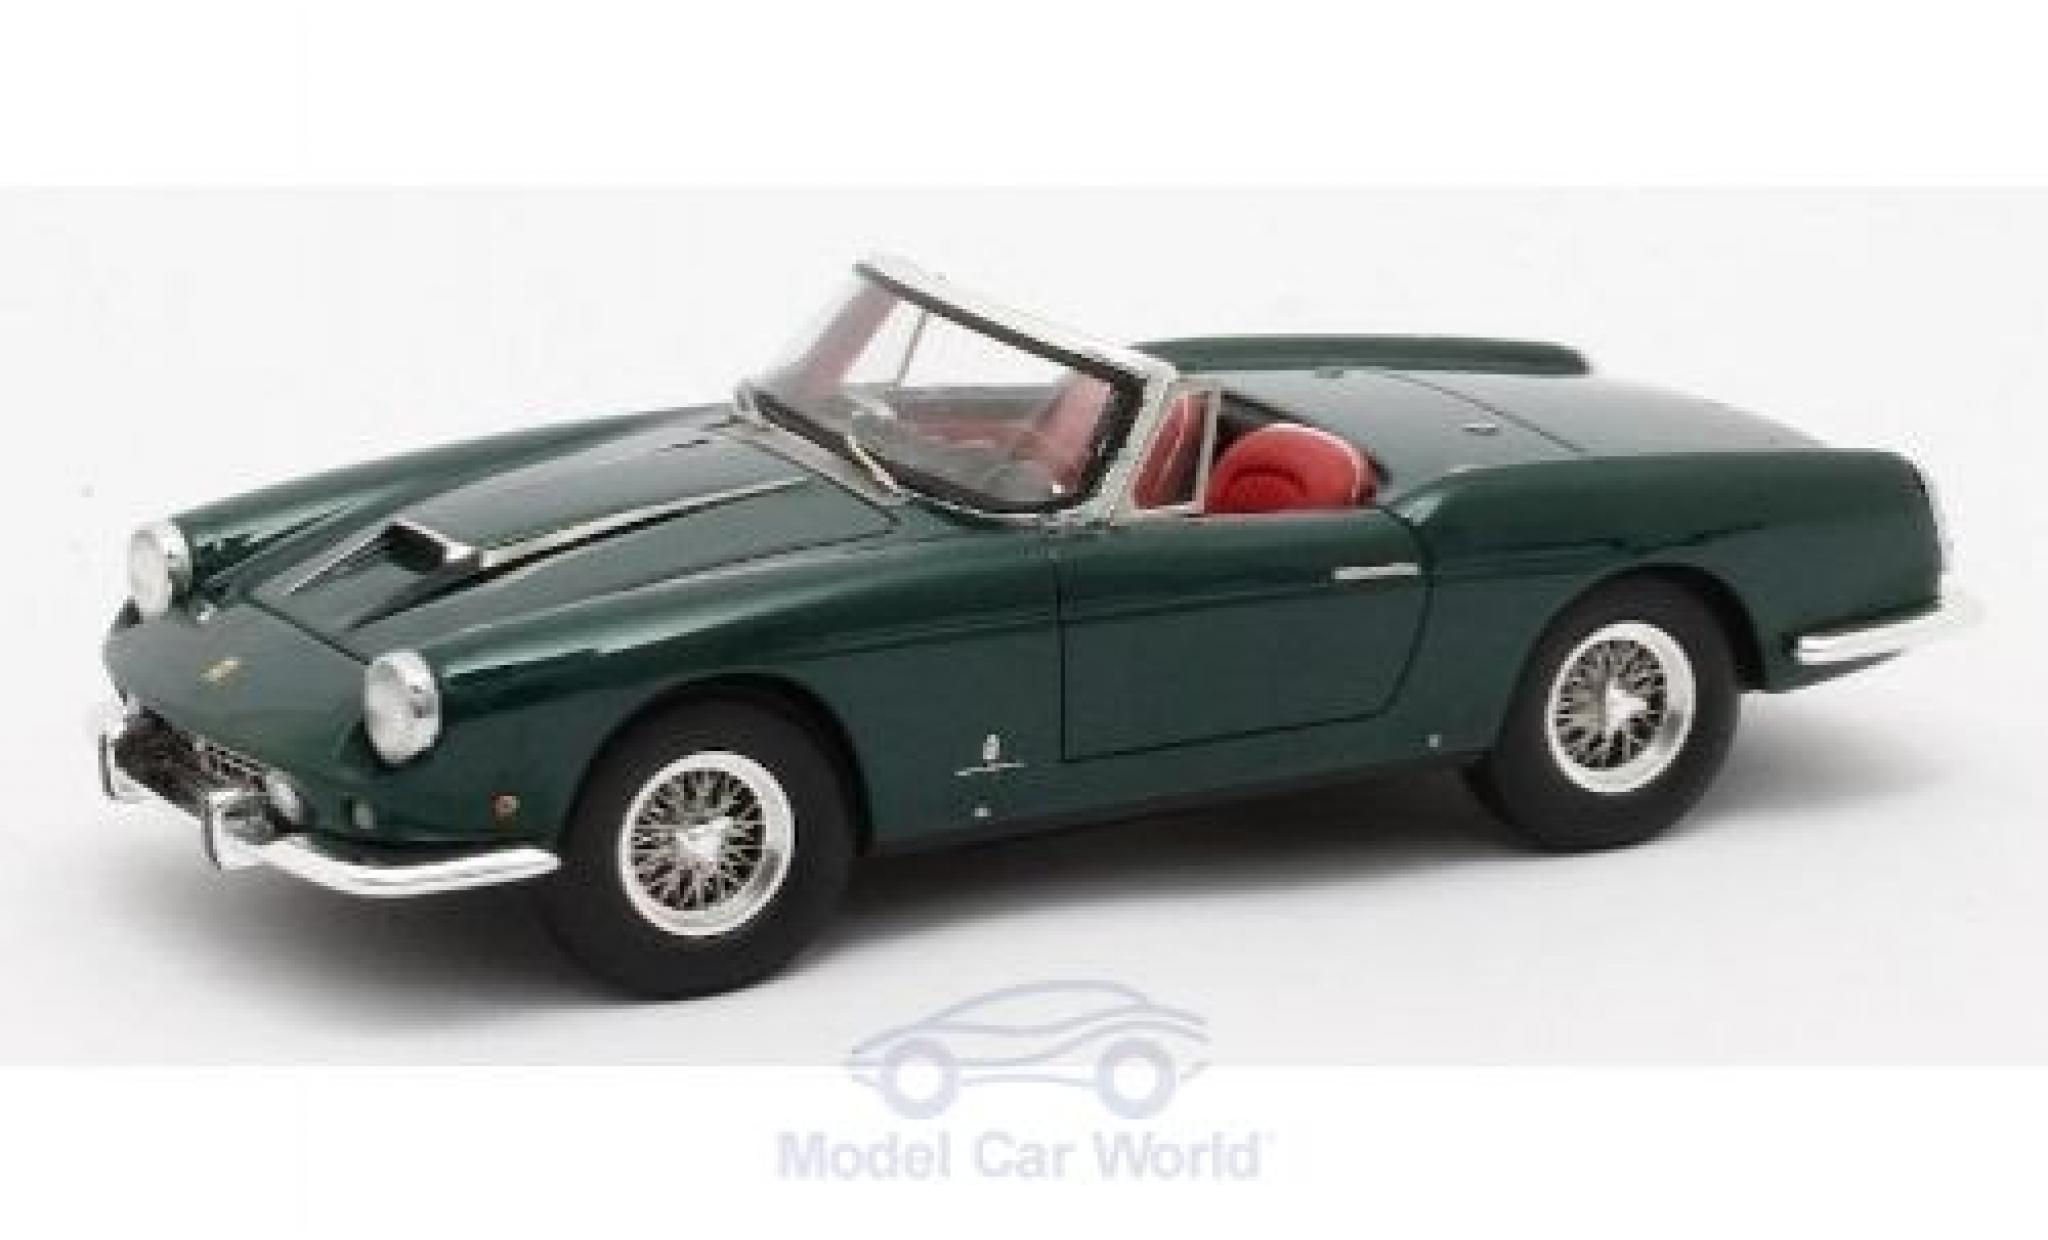 Ferrari 400 1/43 Matrix Superamerica Pininfarina Cabriolet verte 1959 #1611 SA